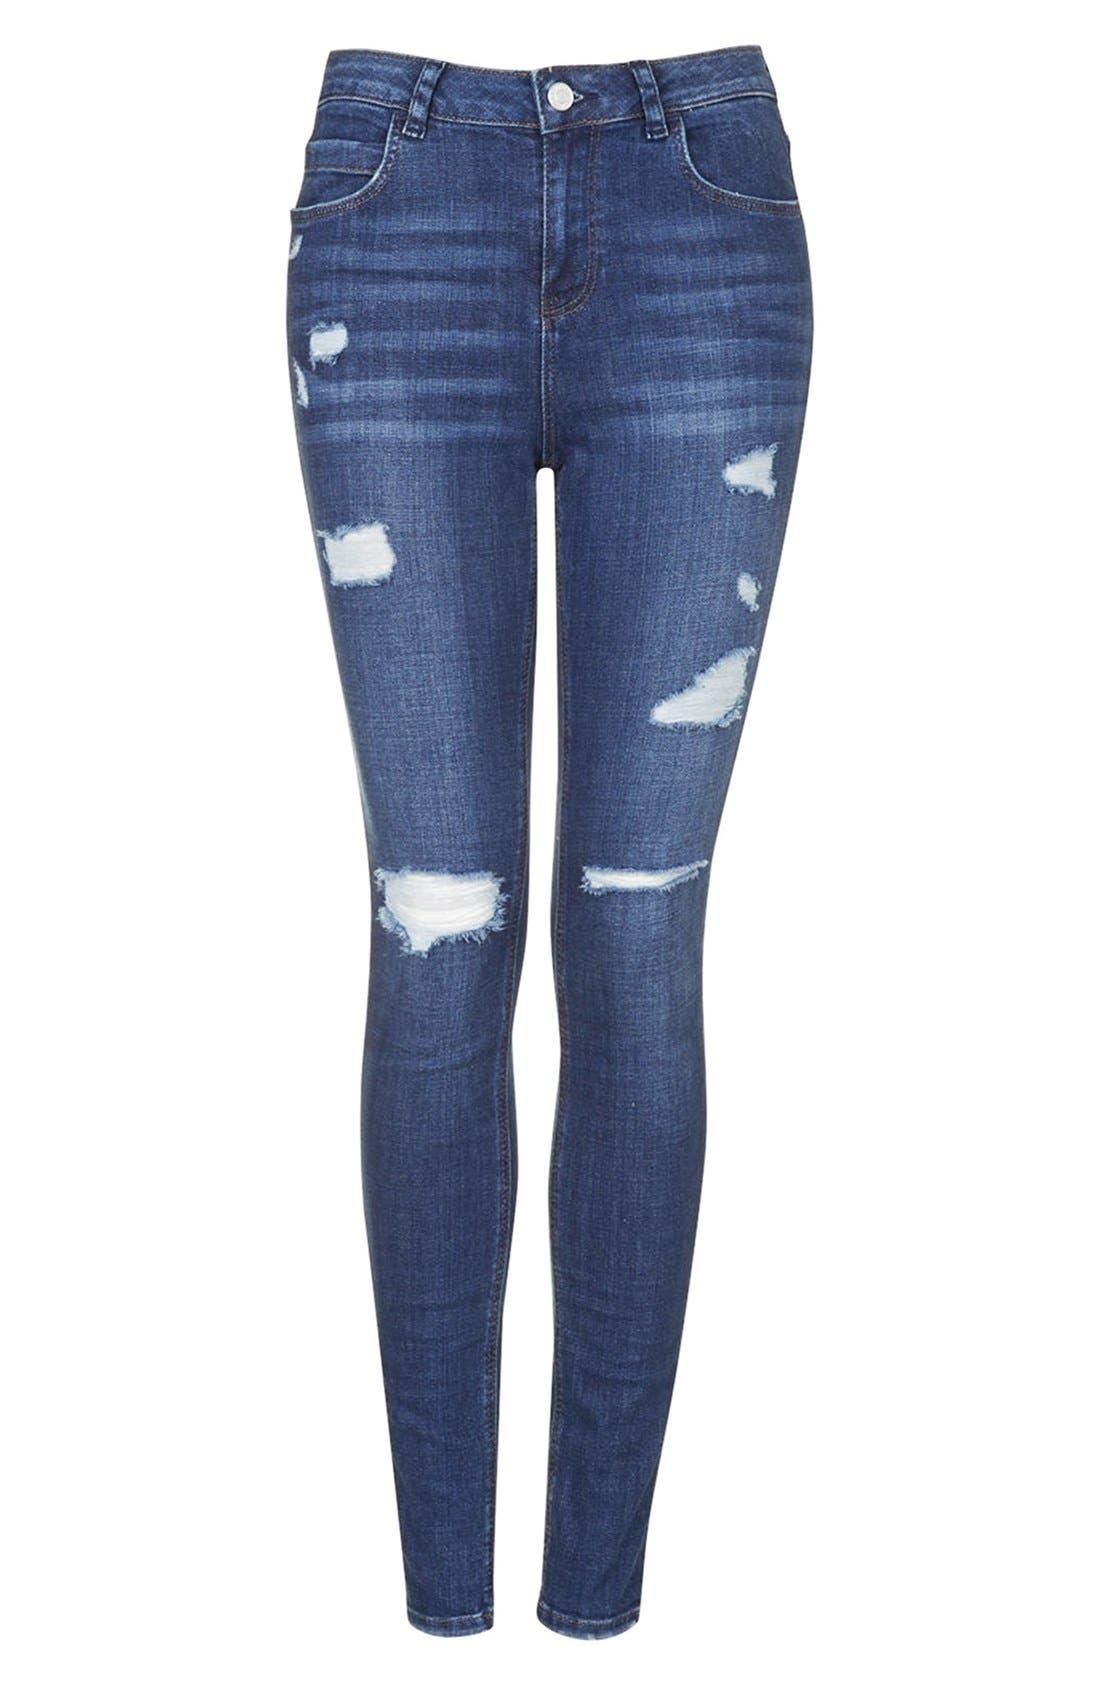 Alternate Image 3  - Topshop Moto Ripped Skinny Jeans (Dark Denim) (Regular & Short)